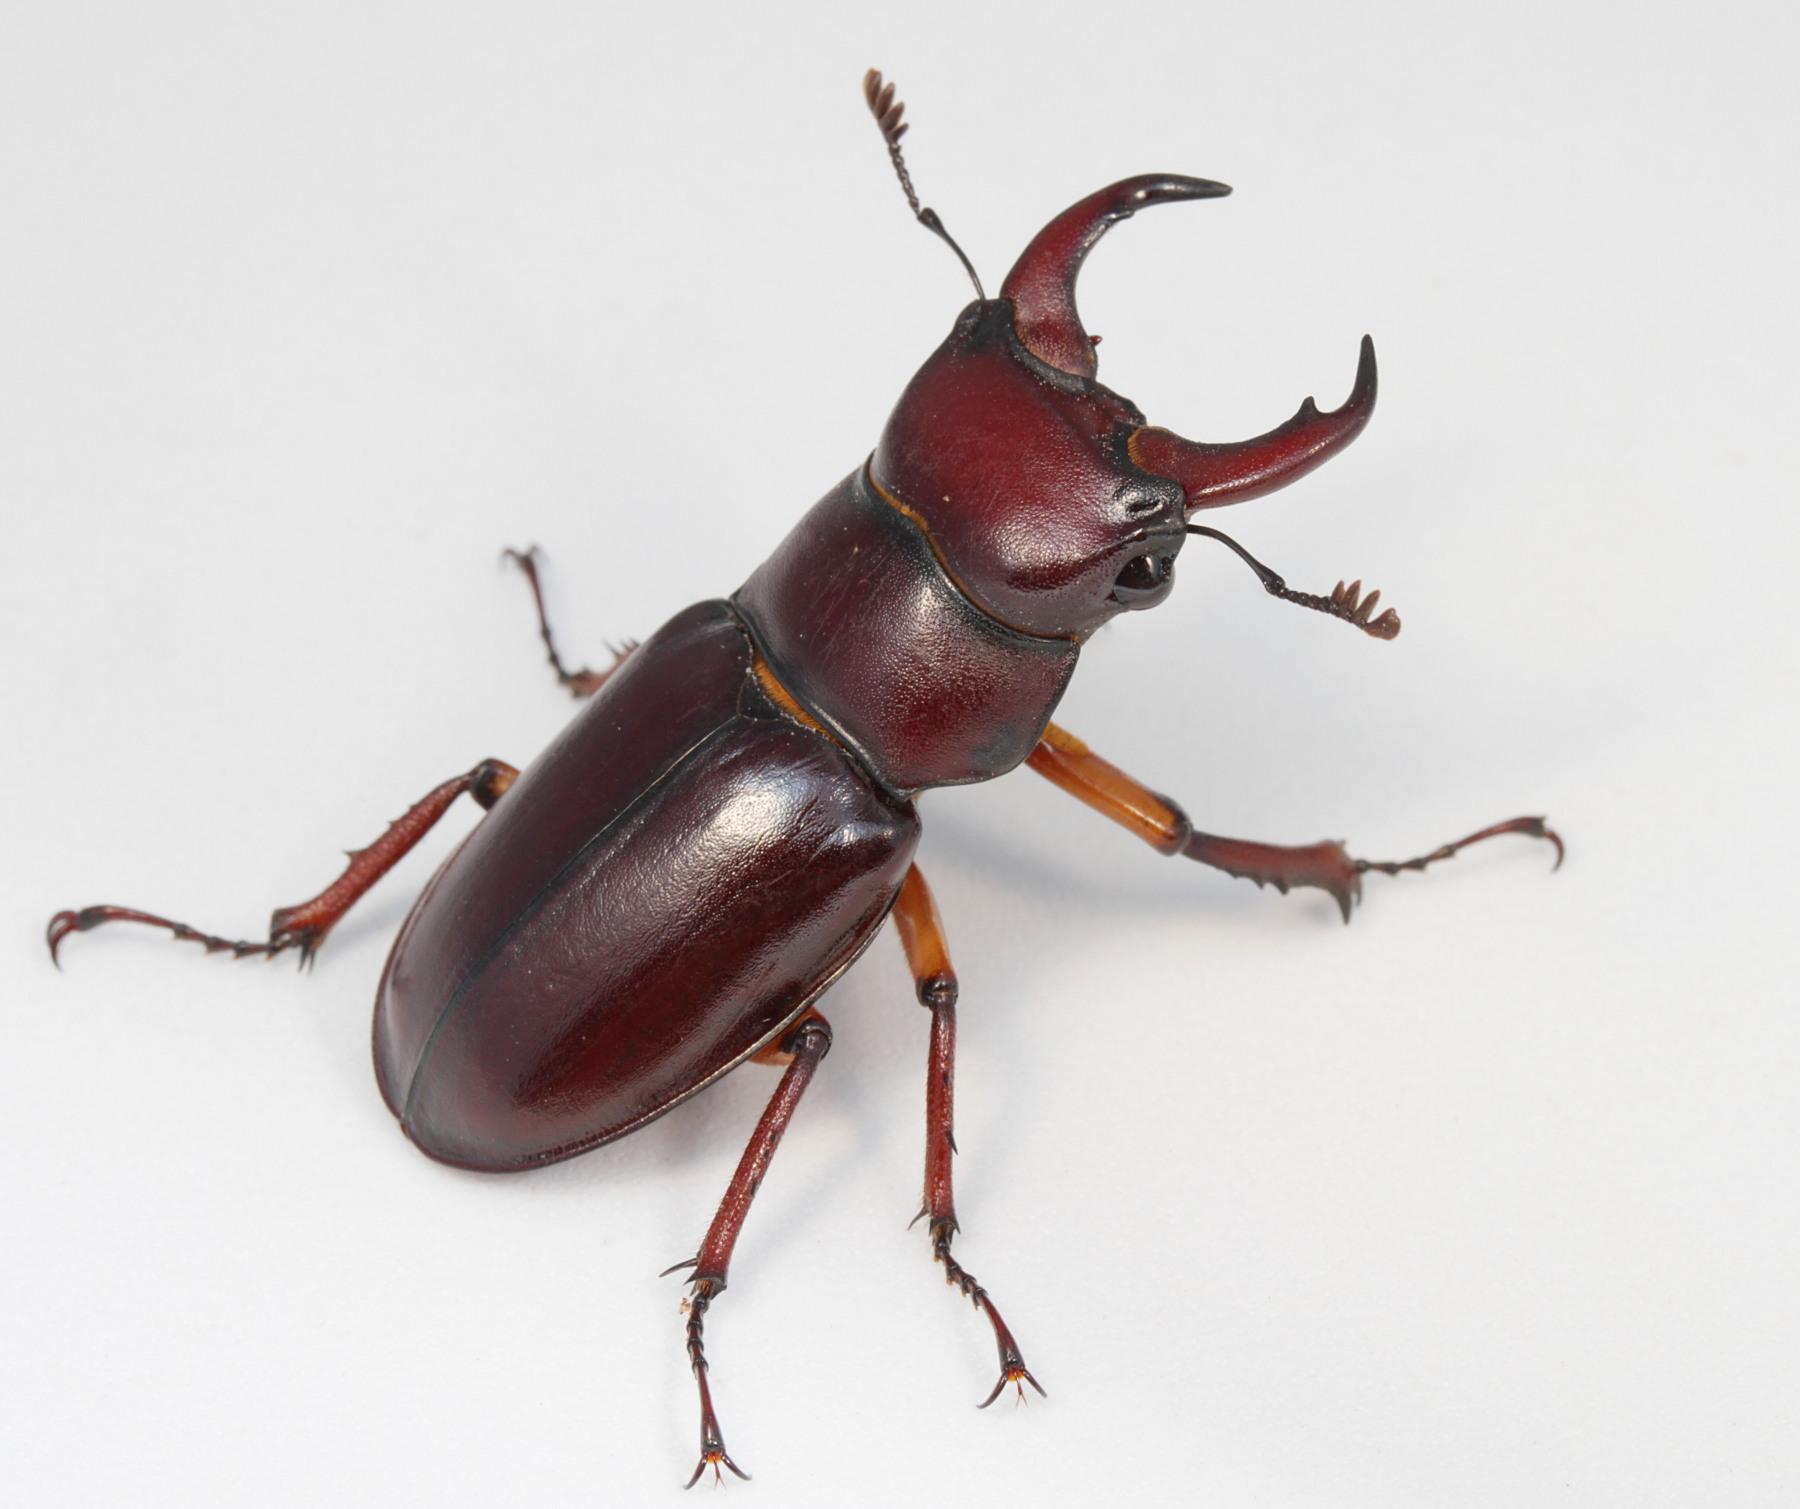 Reddish-brown Stag Beetle (Lucanus capreolus) · iNaturalist.org